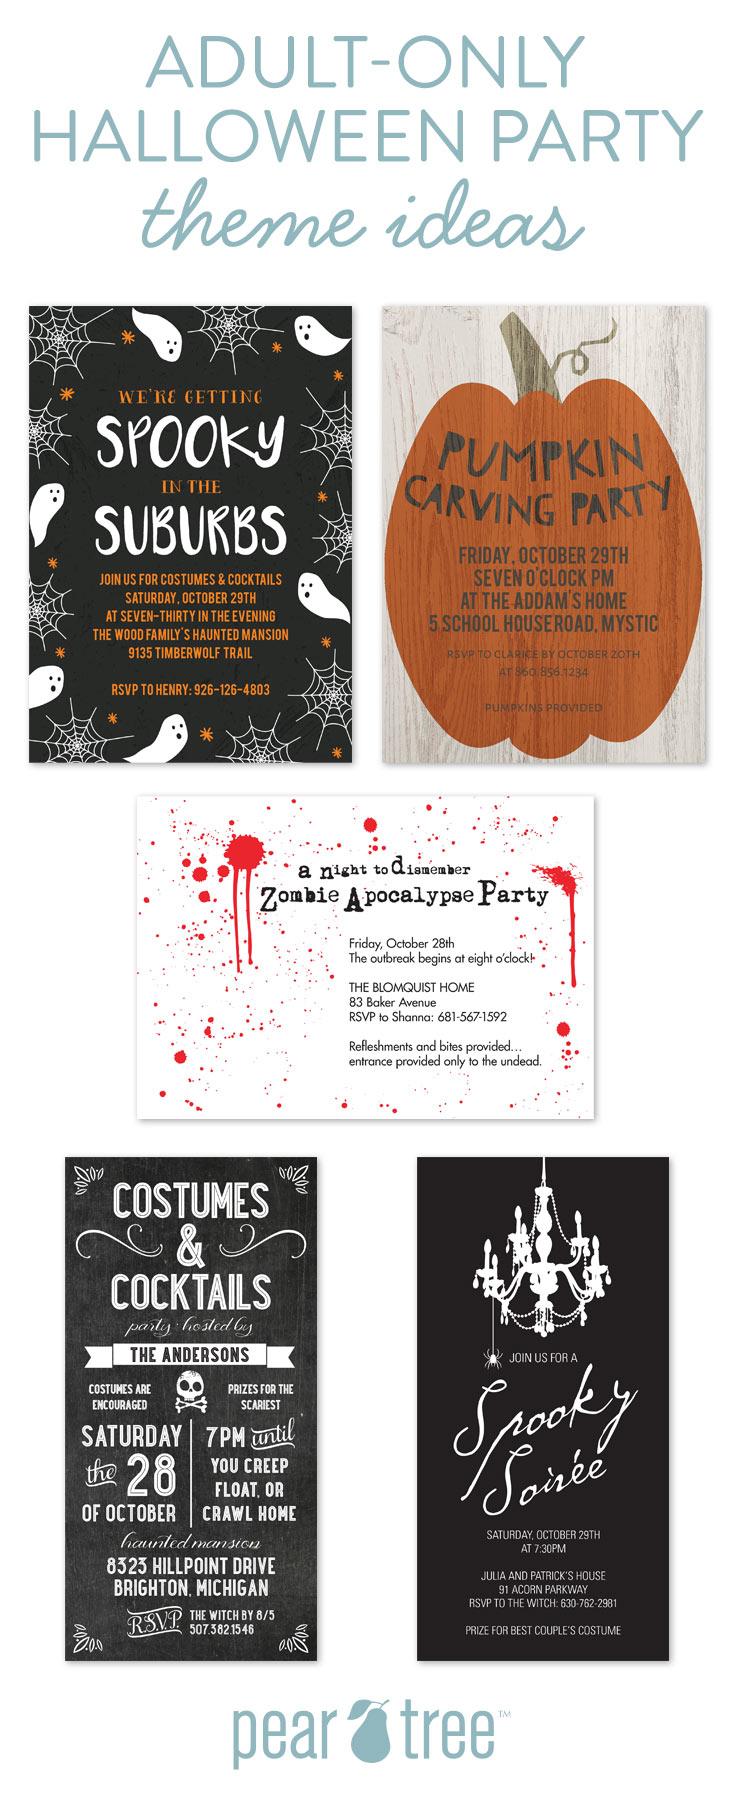 Adult Halloween Party Theme Ideas | Pear Tree Blog